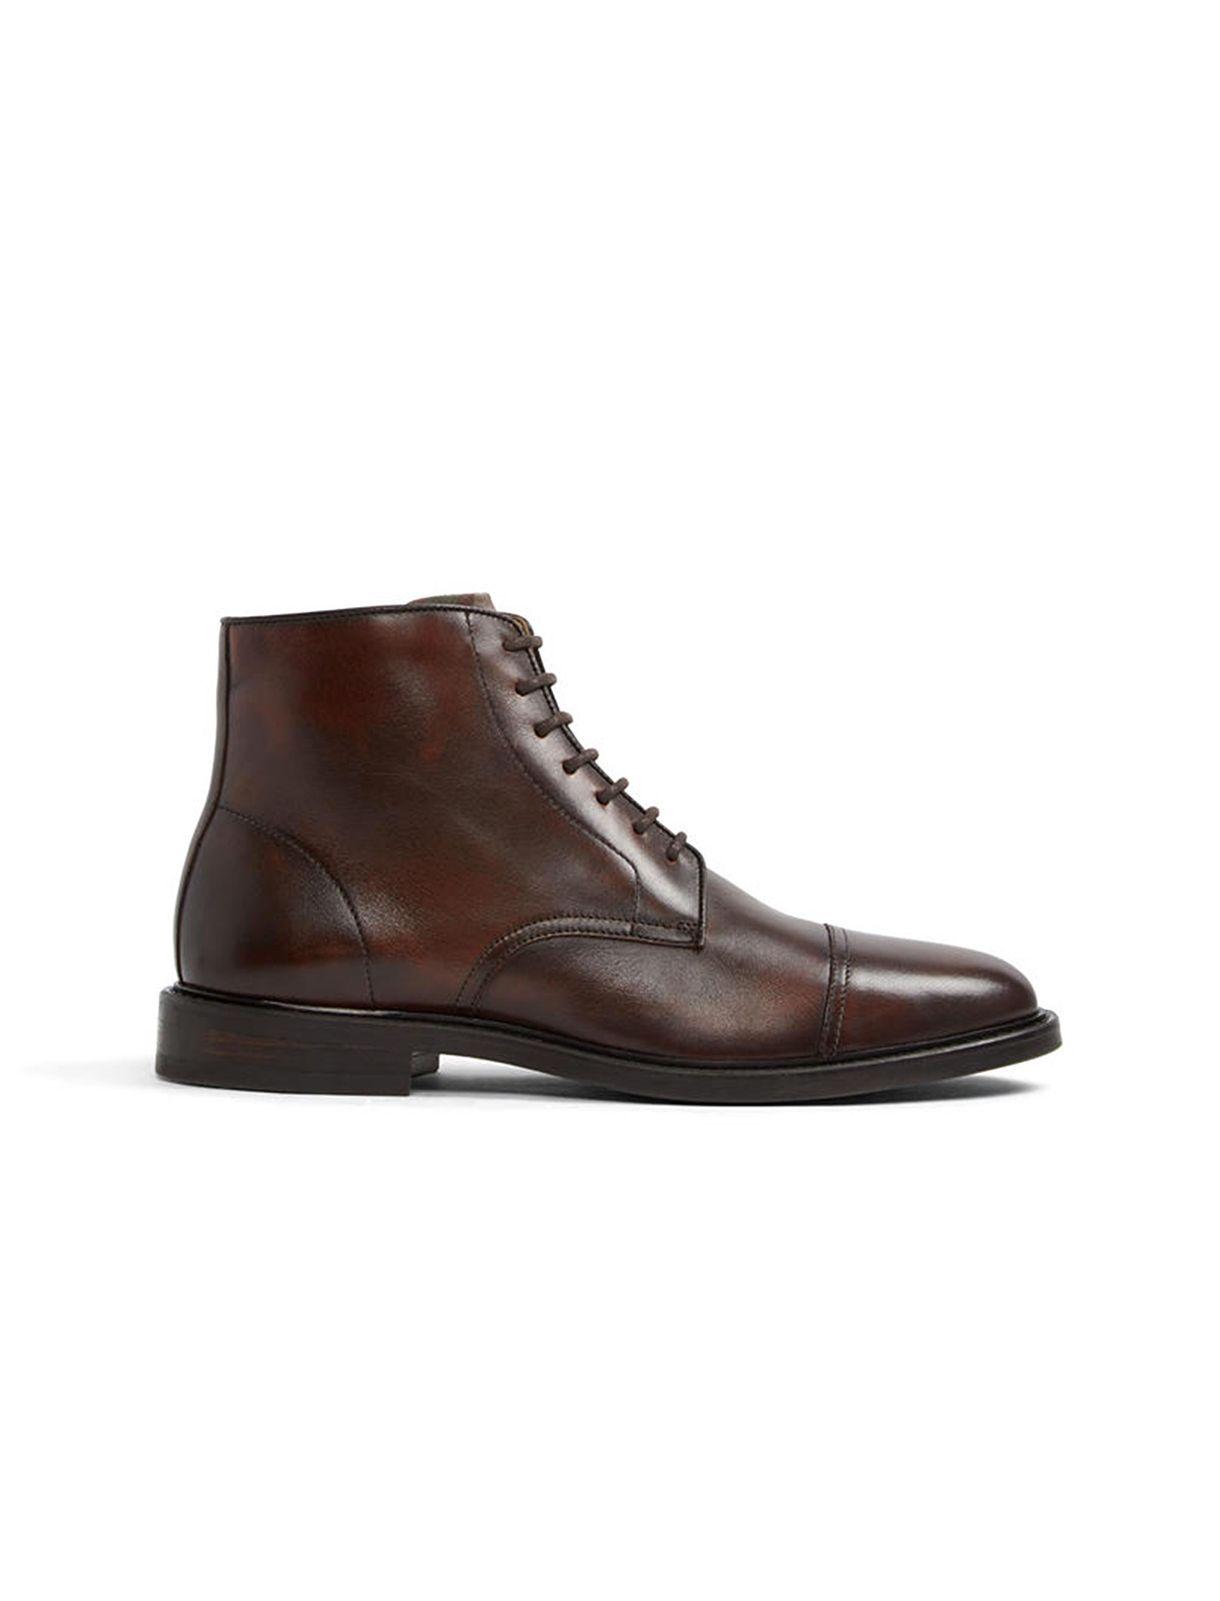 نیم بوت چرم رسمی مردانه – آلدو  Men Leather Formal Ankle Boots – Aldo